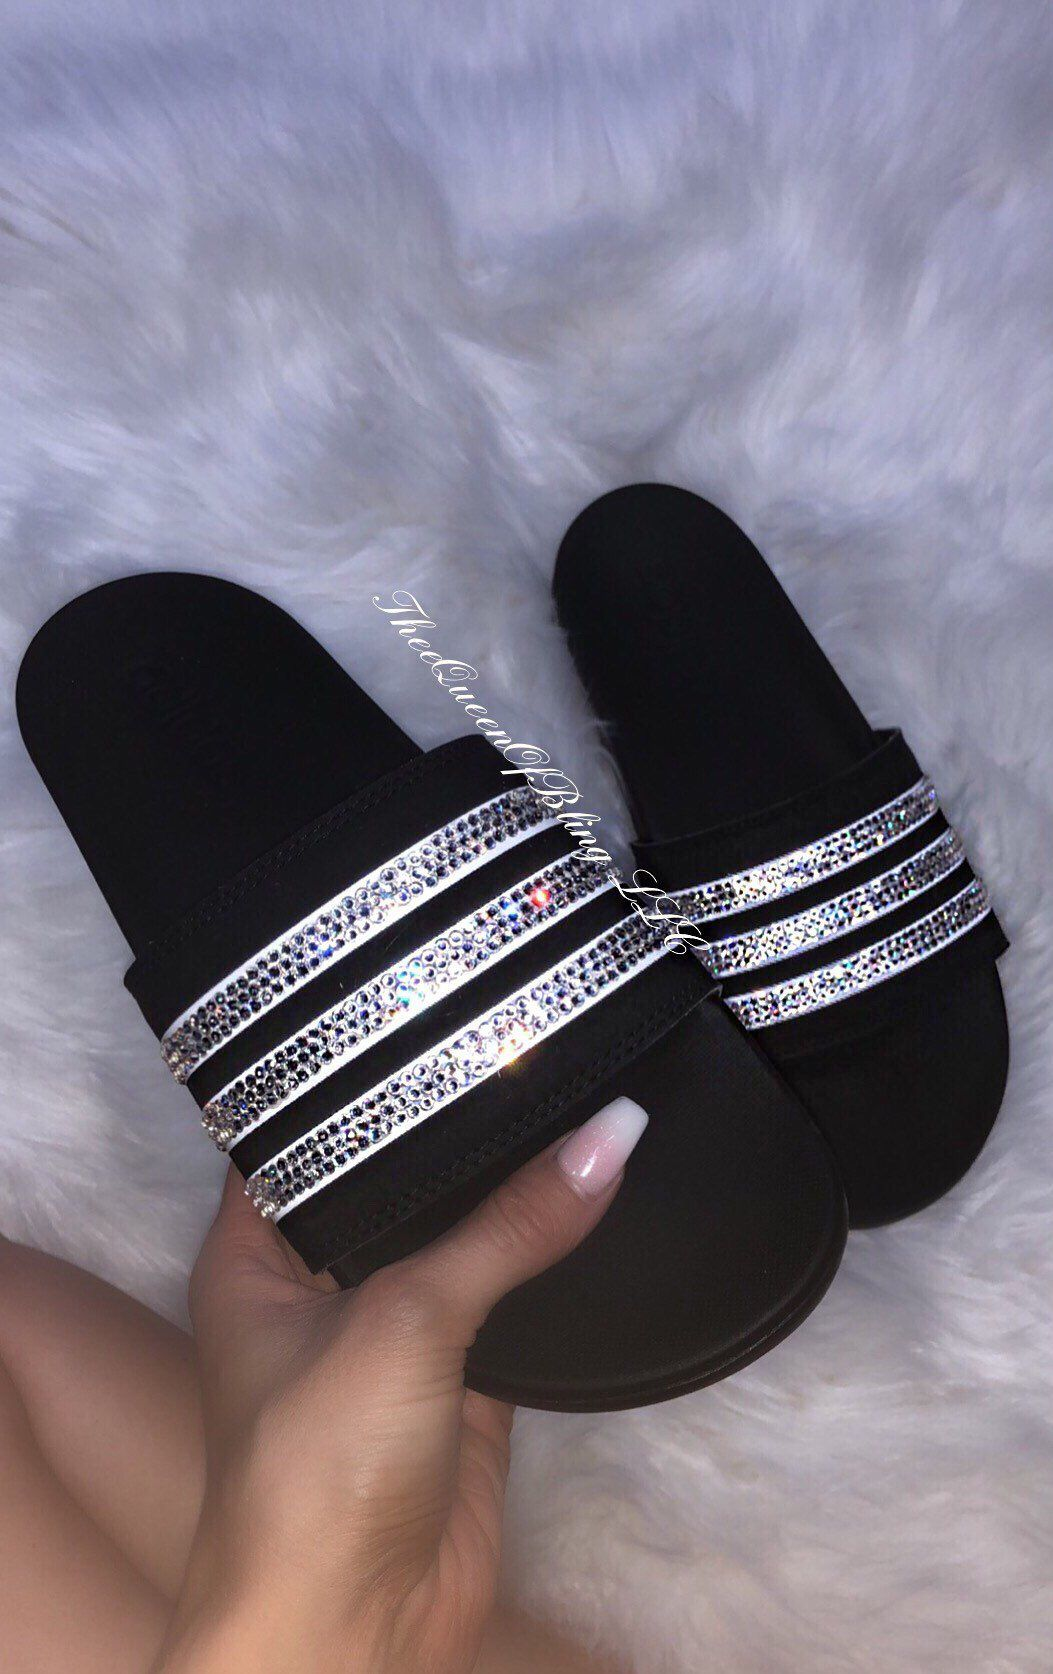 Womens Adidas slides with SWARVOSKI crystals Adidas